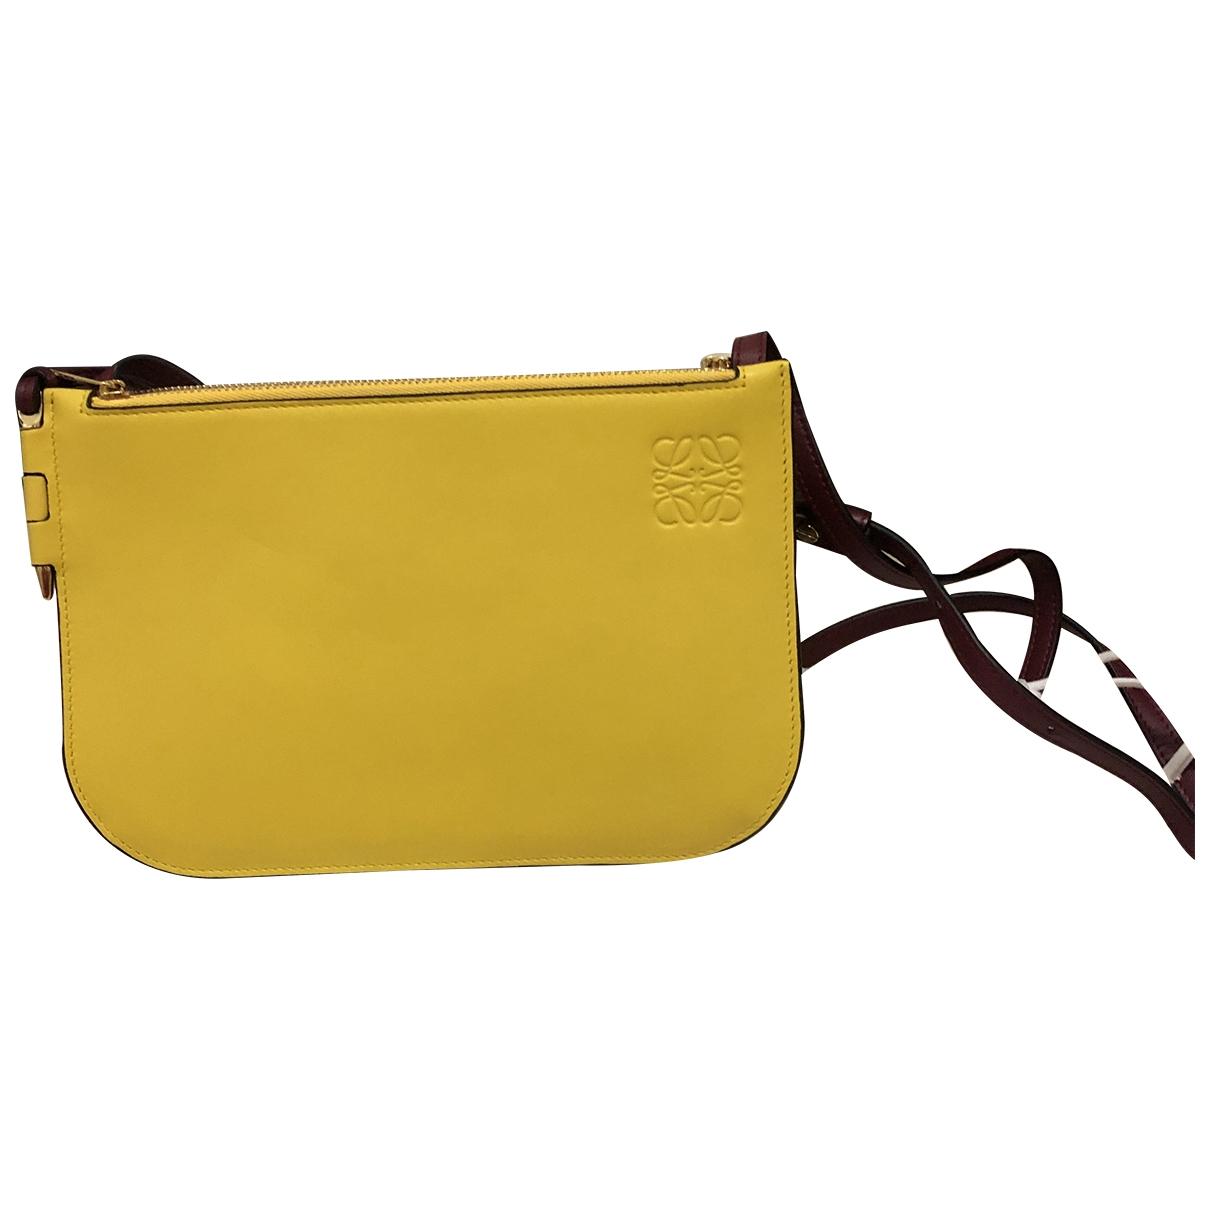 Loewe \N Yellow Leather handbag for Women \N